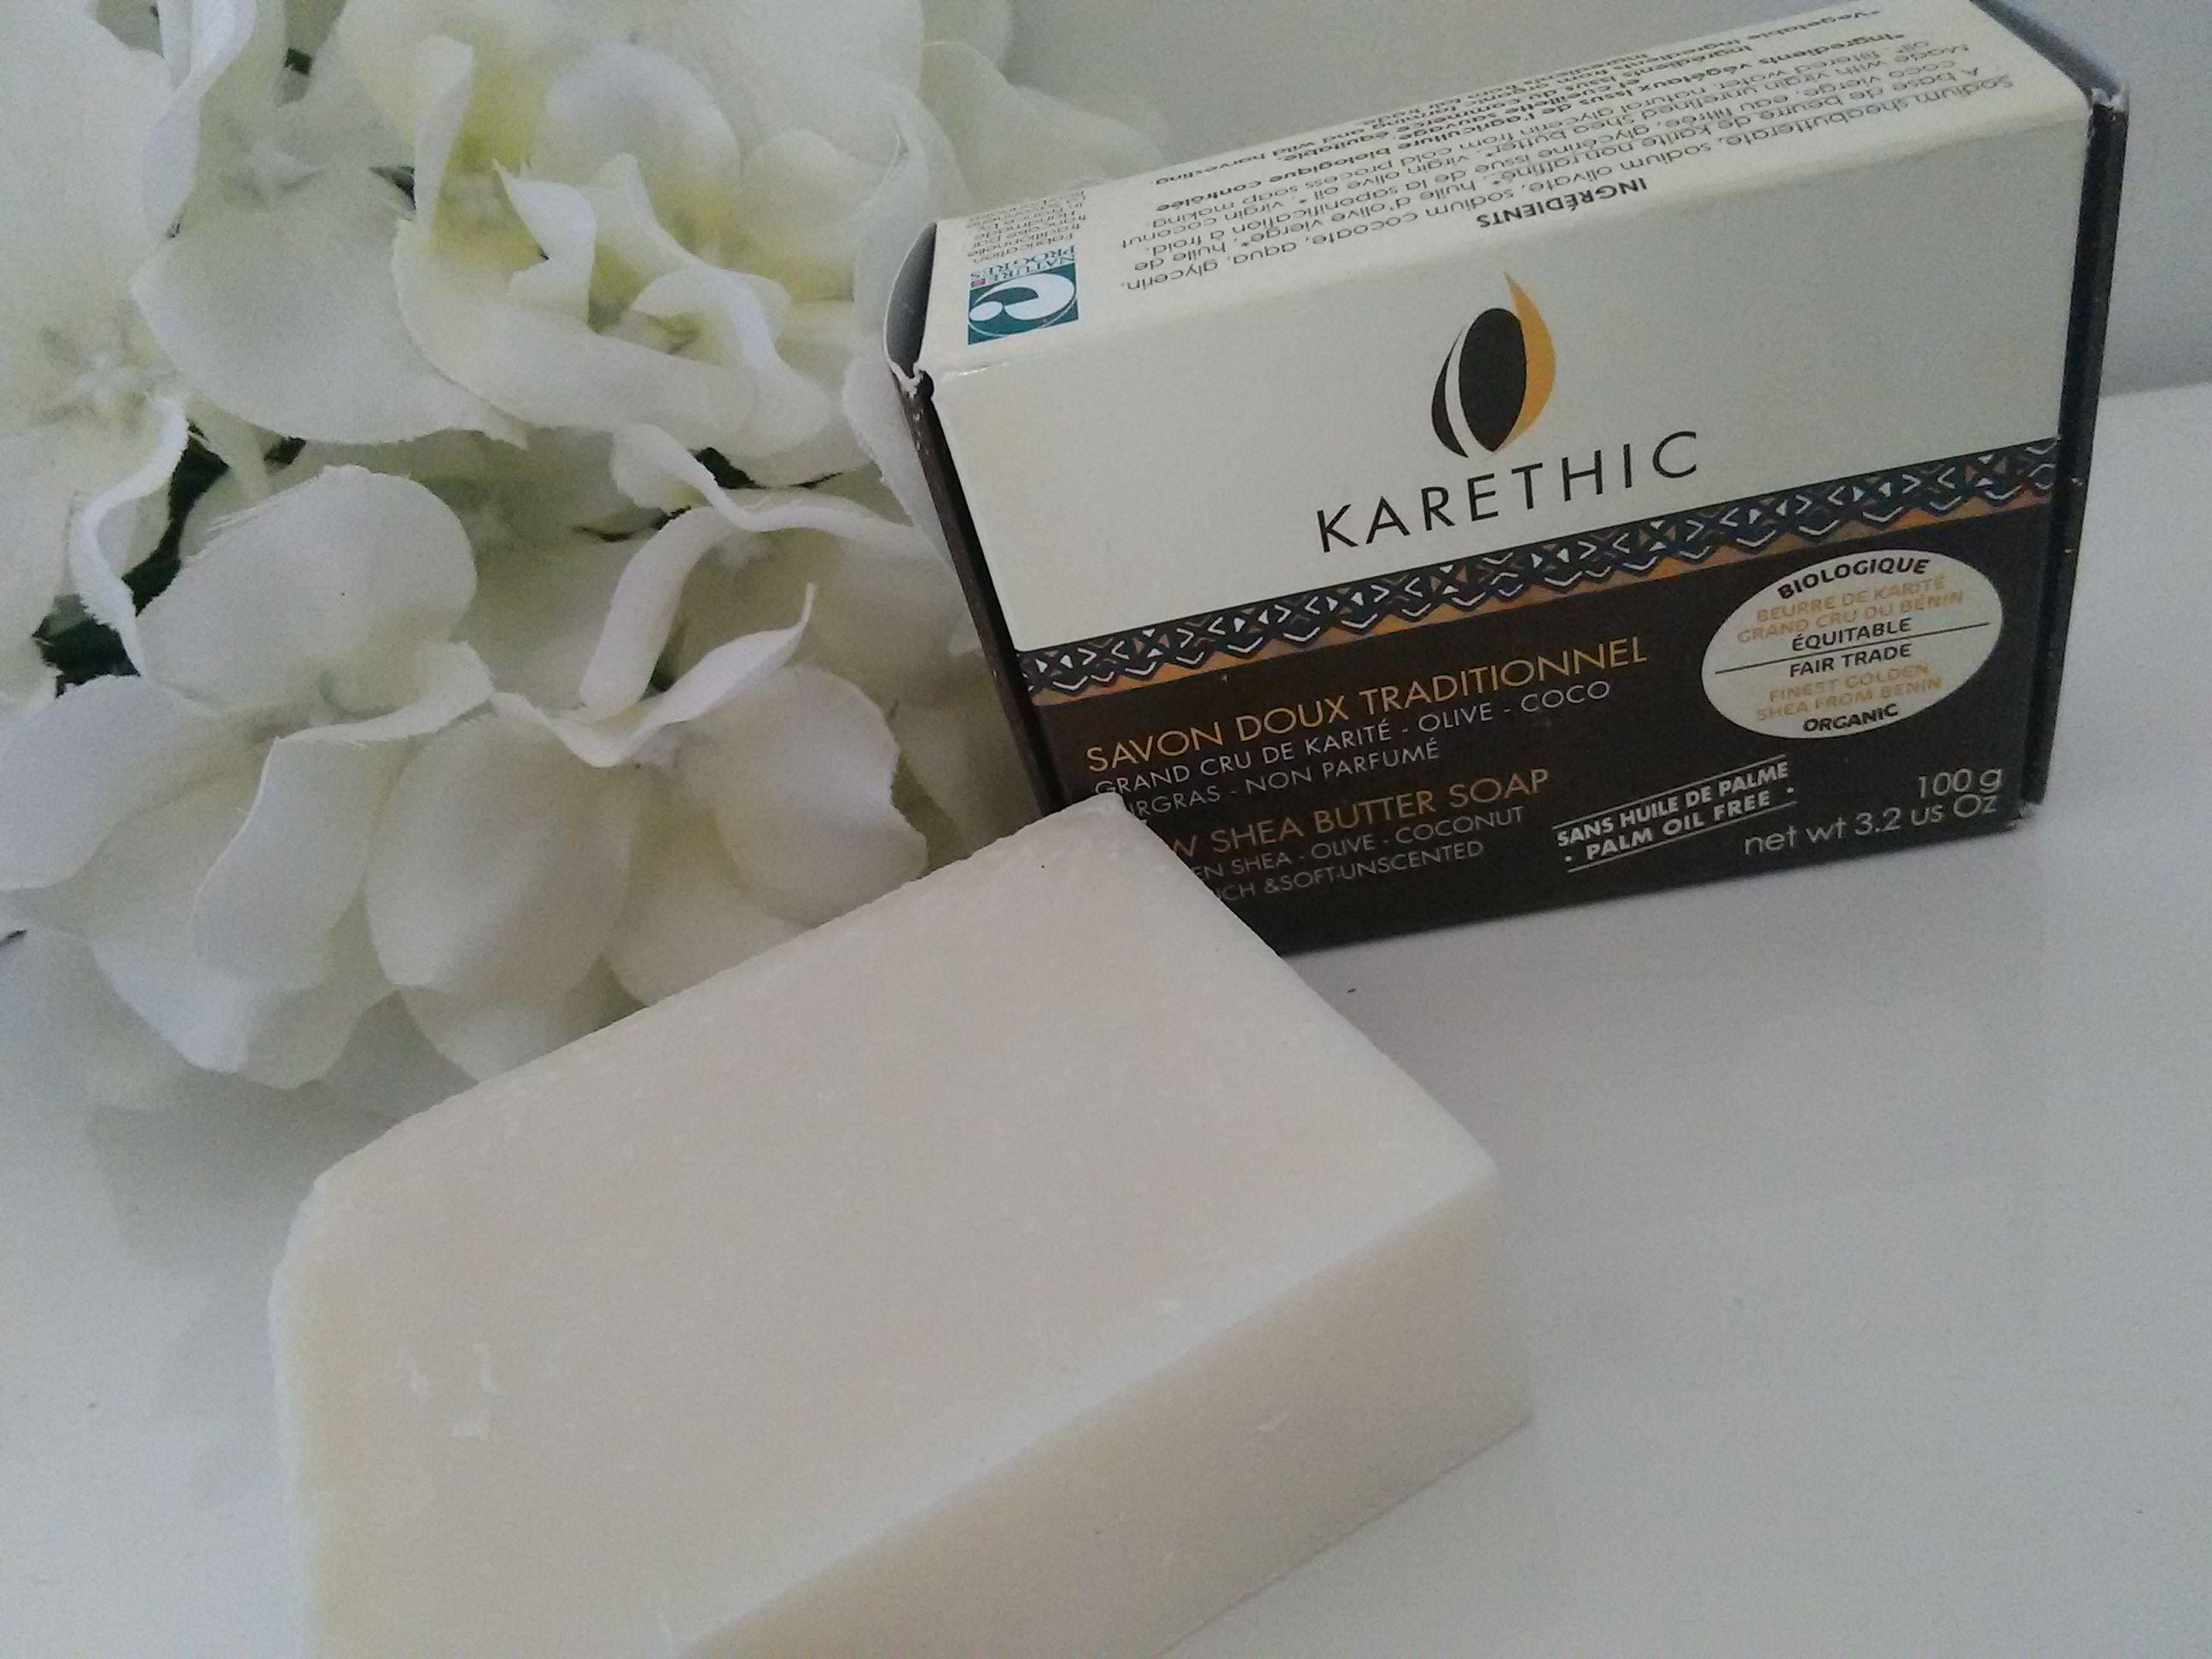 savon karethic